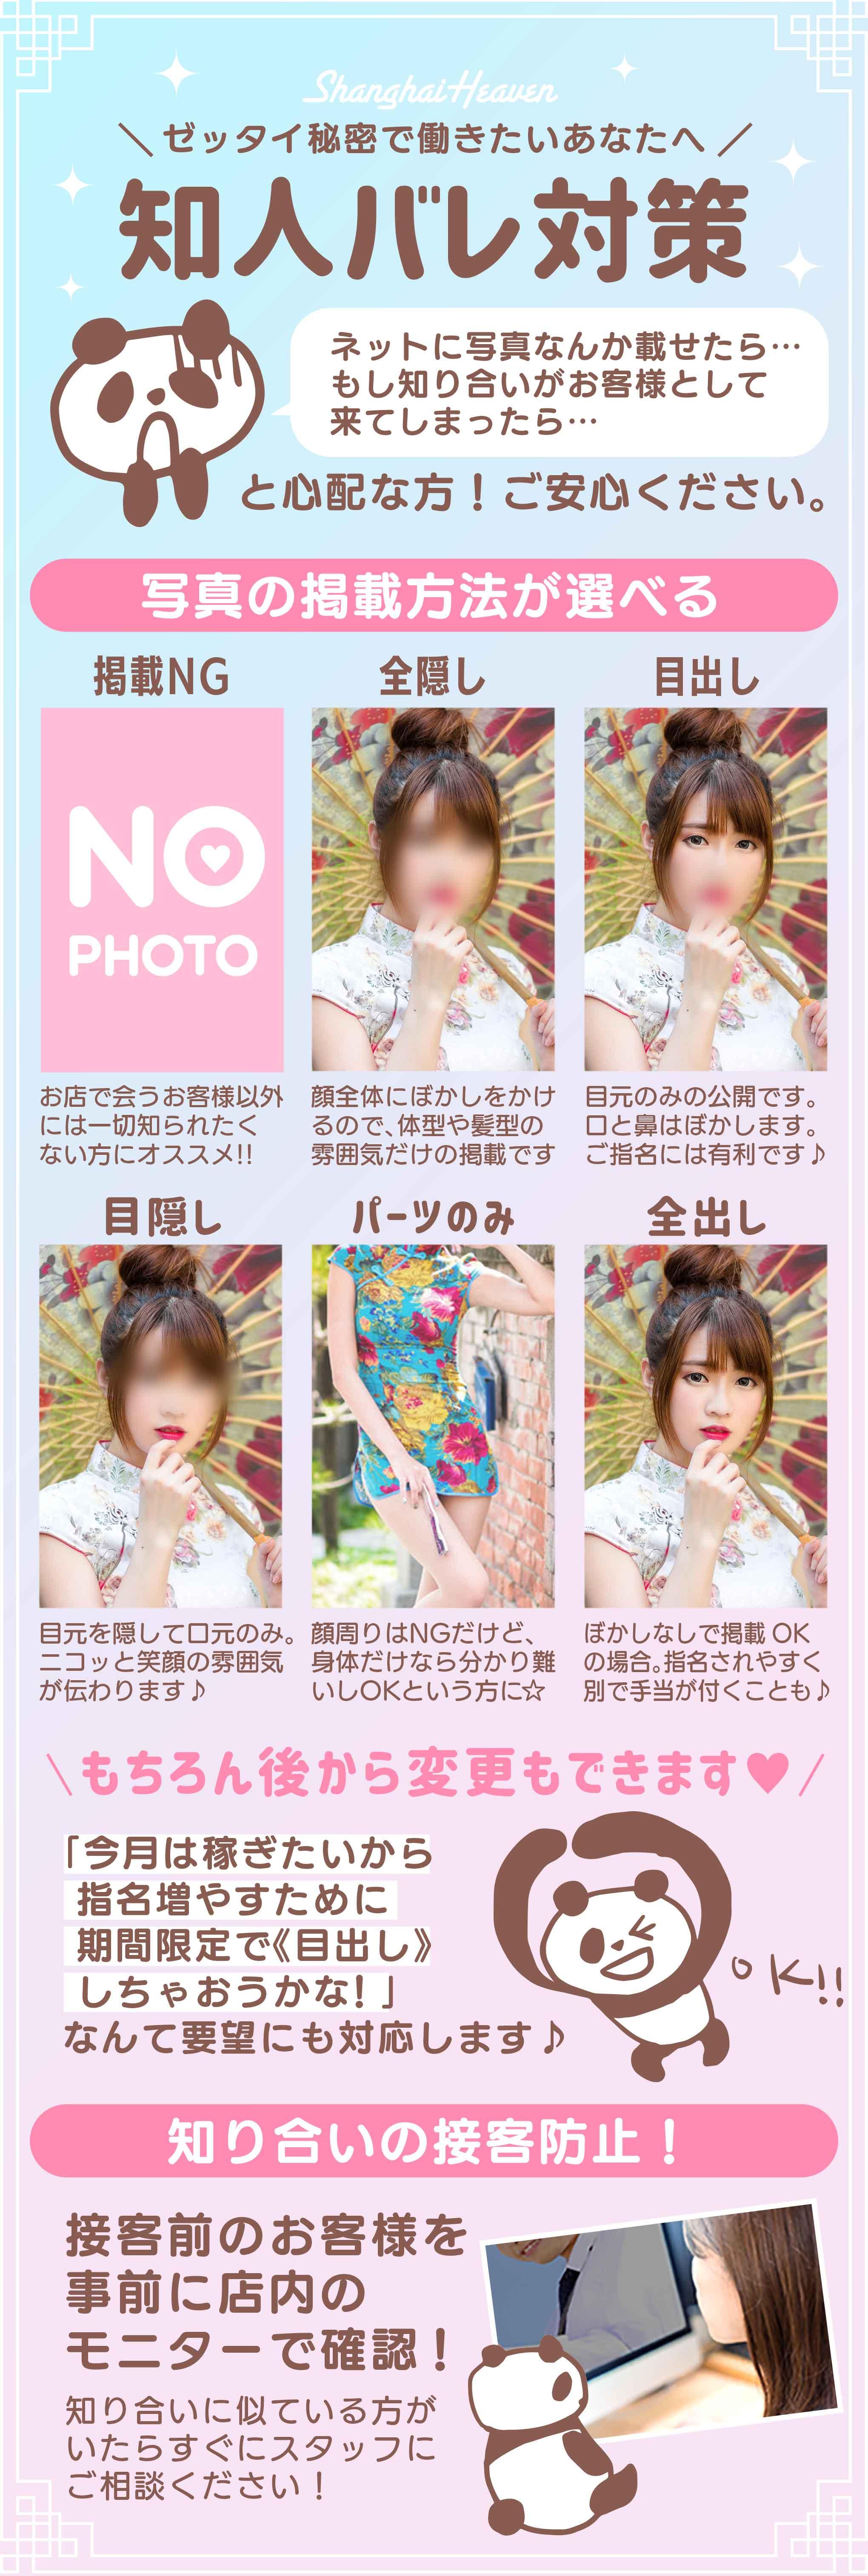 http://www.kyujin-yes.com/img/upd-img/hukuoka/shan/image_9496.jpg